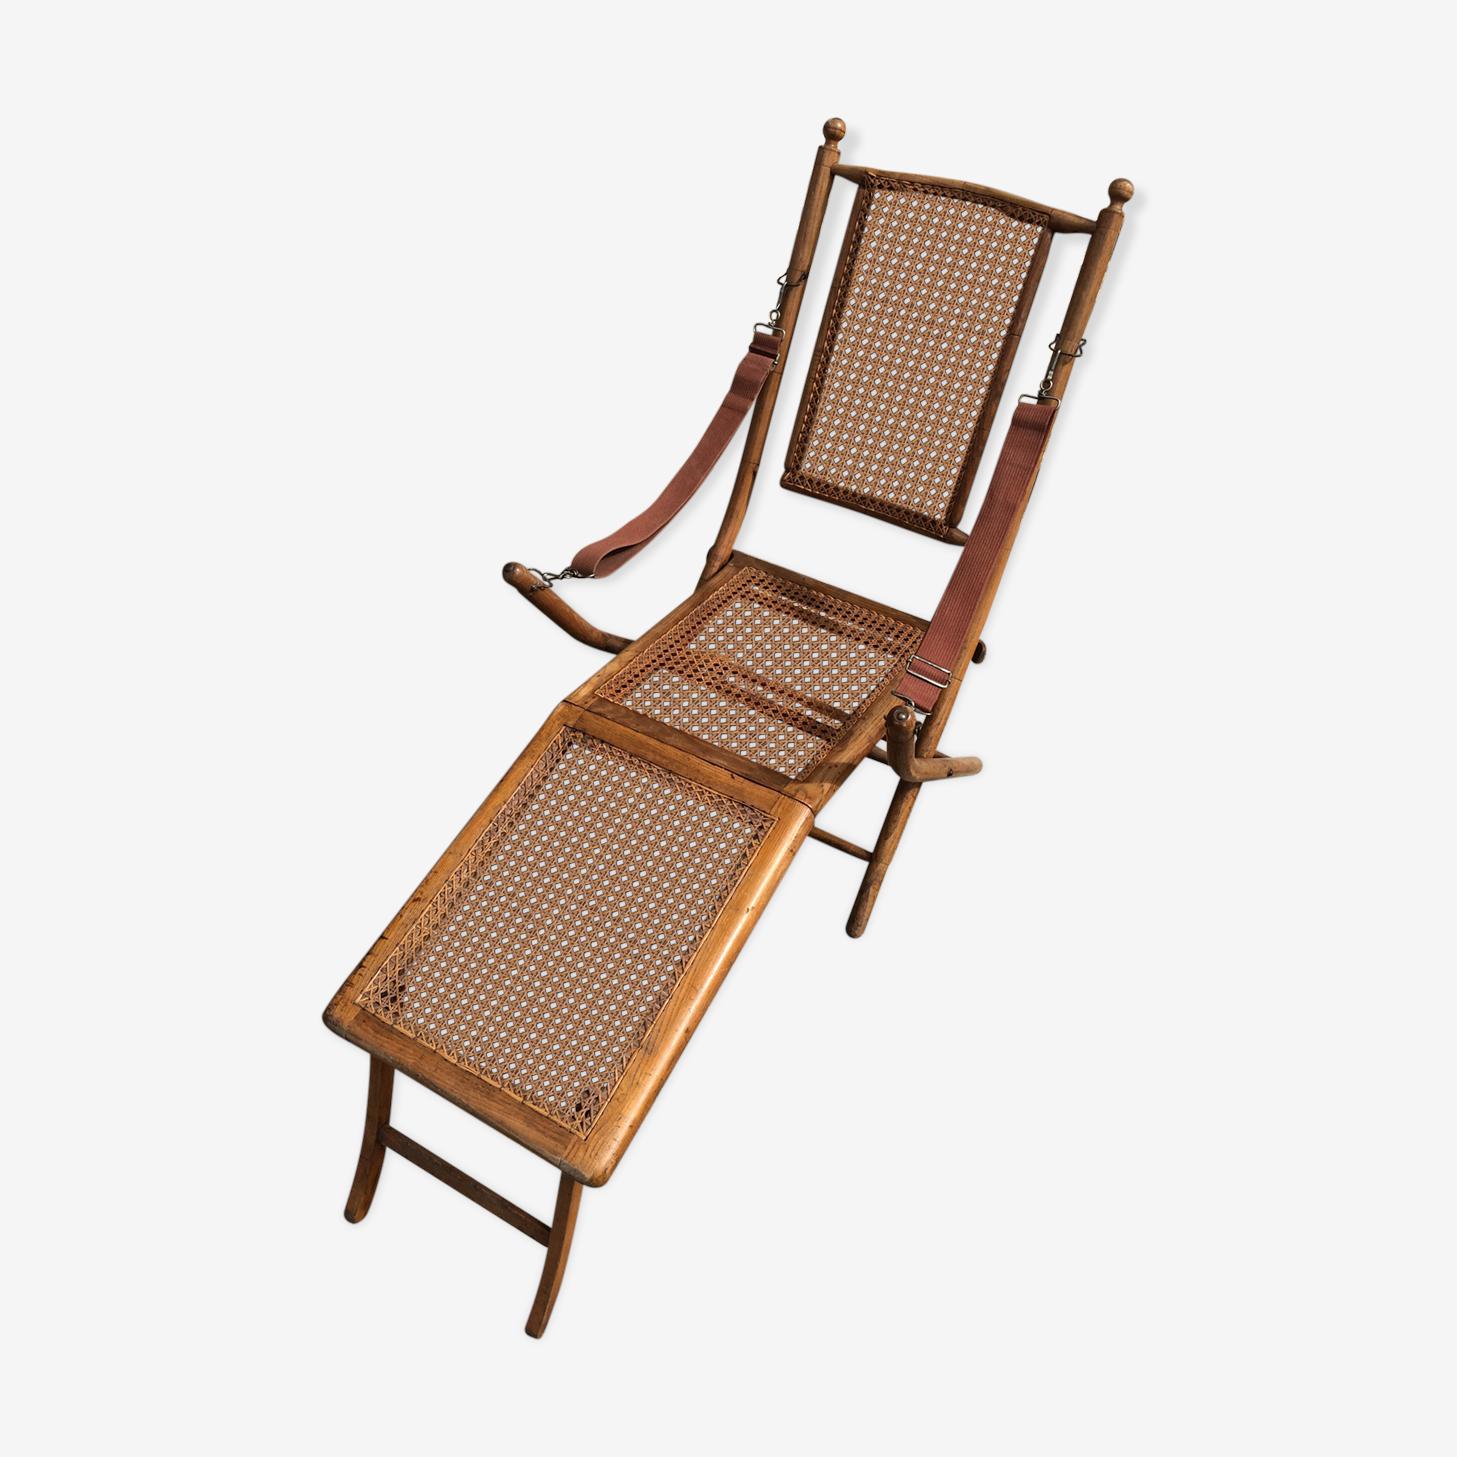 Chaise longue bois & cannage